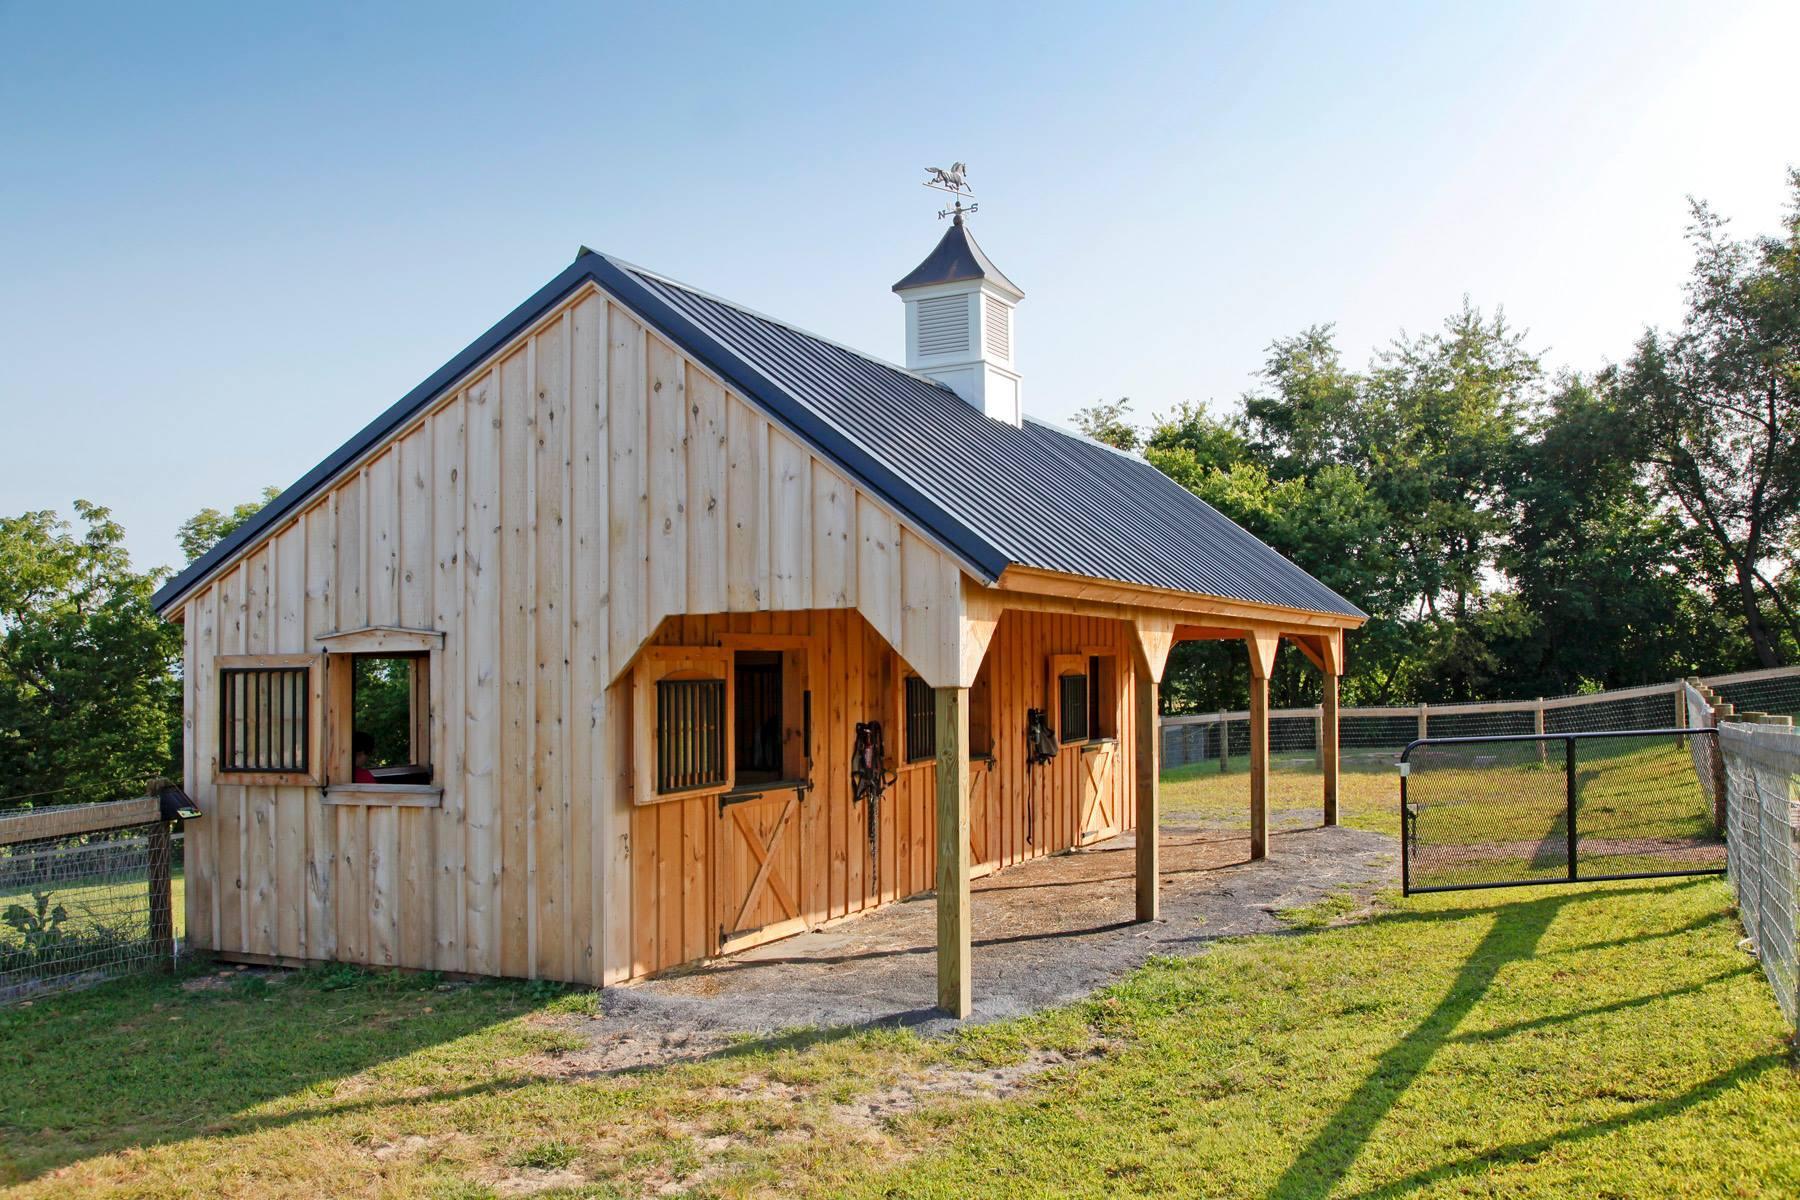 Horse barn builders llc in gettysburg pa 17325 for Horse barn builder